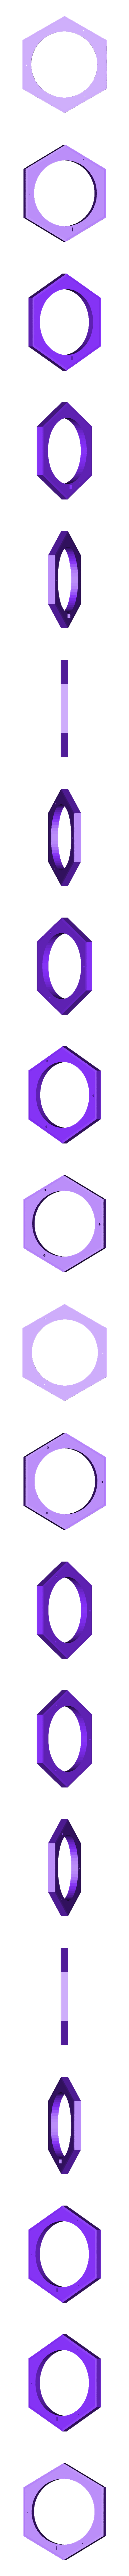 BoltNutTensegrity_top.stl Descargar archivo STL gratis BoltNut-Tensegrity • Modelo para imprimir en 3D, Seabird